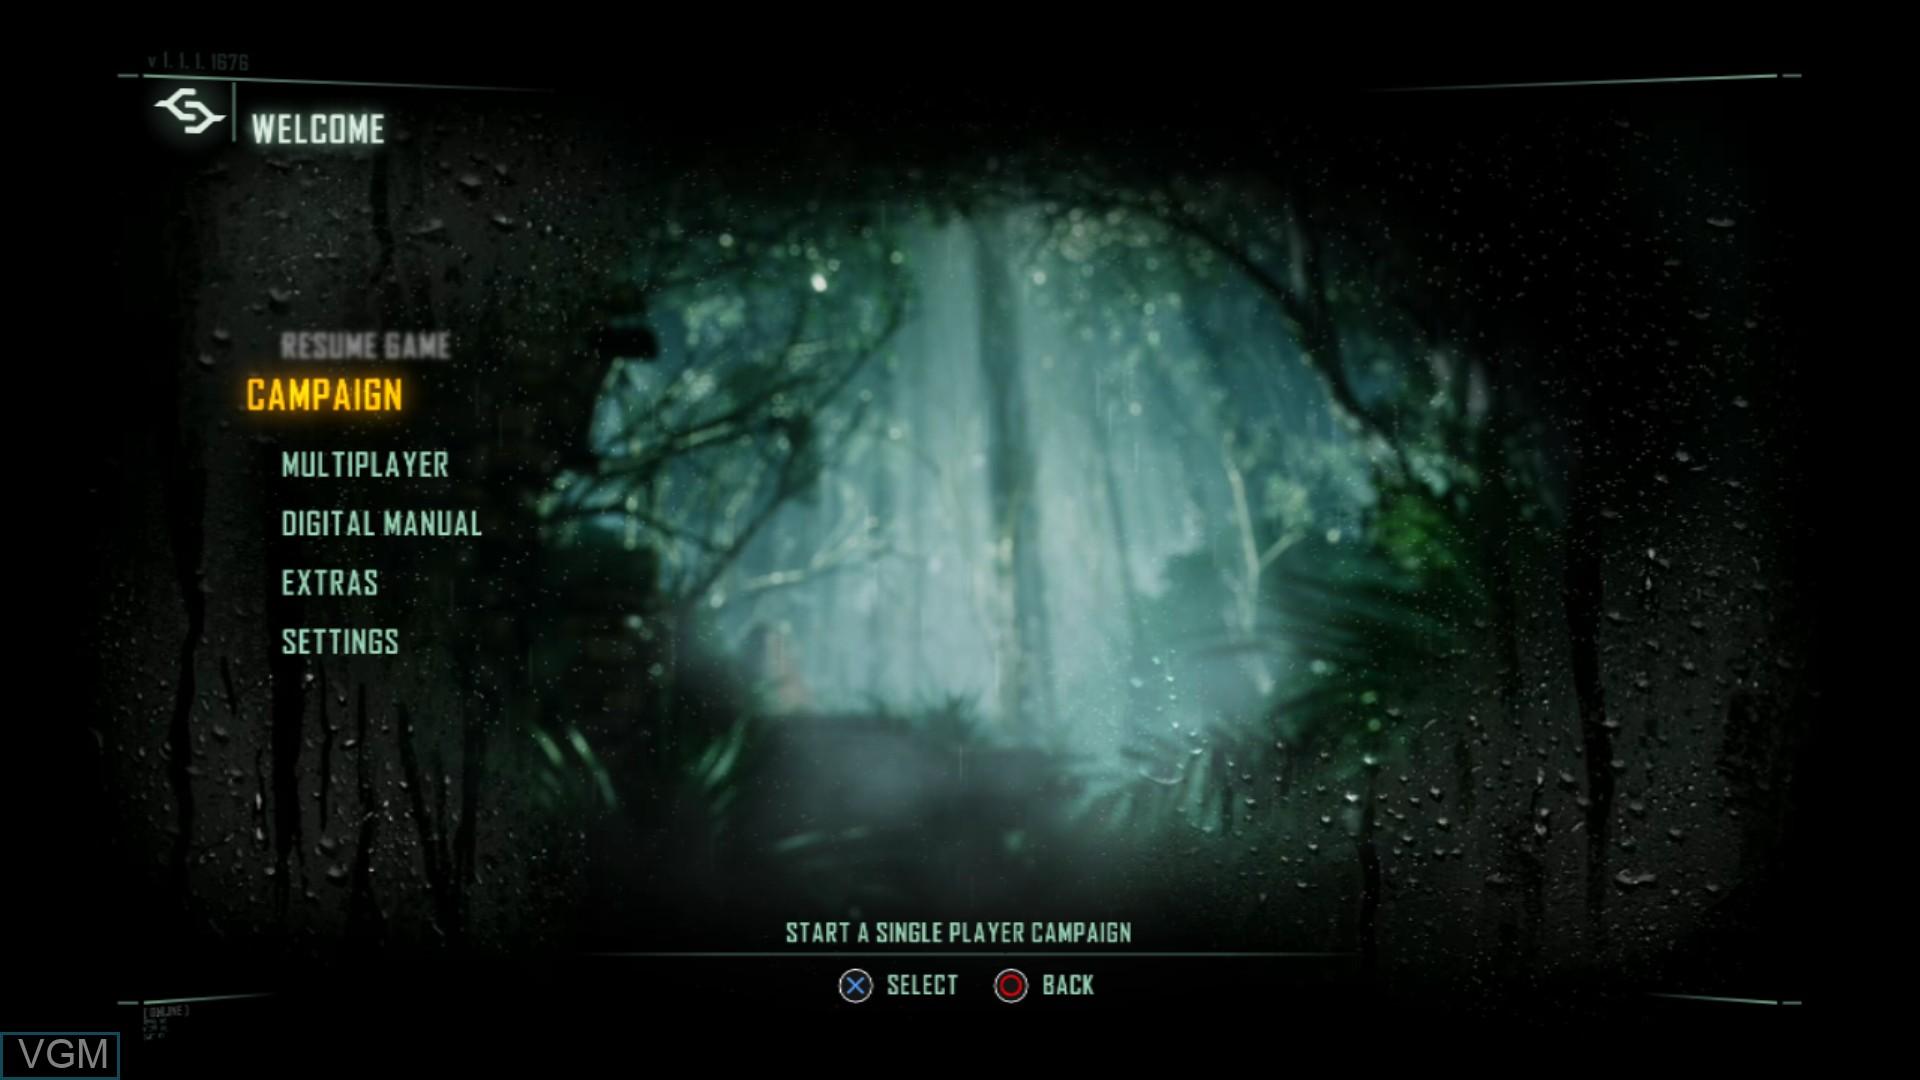 Image du menu du jeu Crysis 3 sur Sony Playstation 3